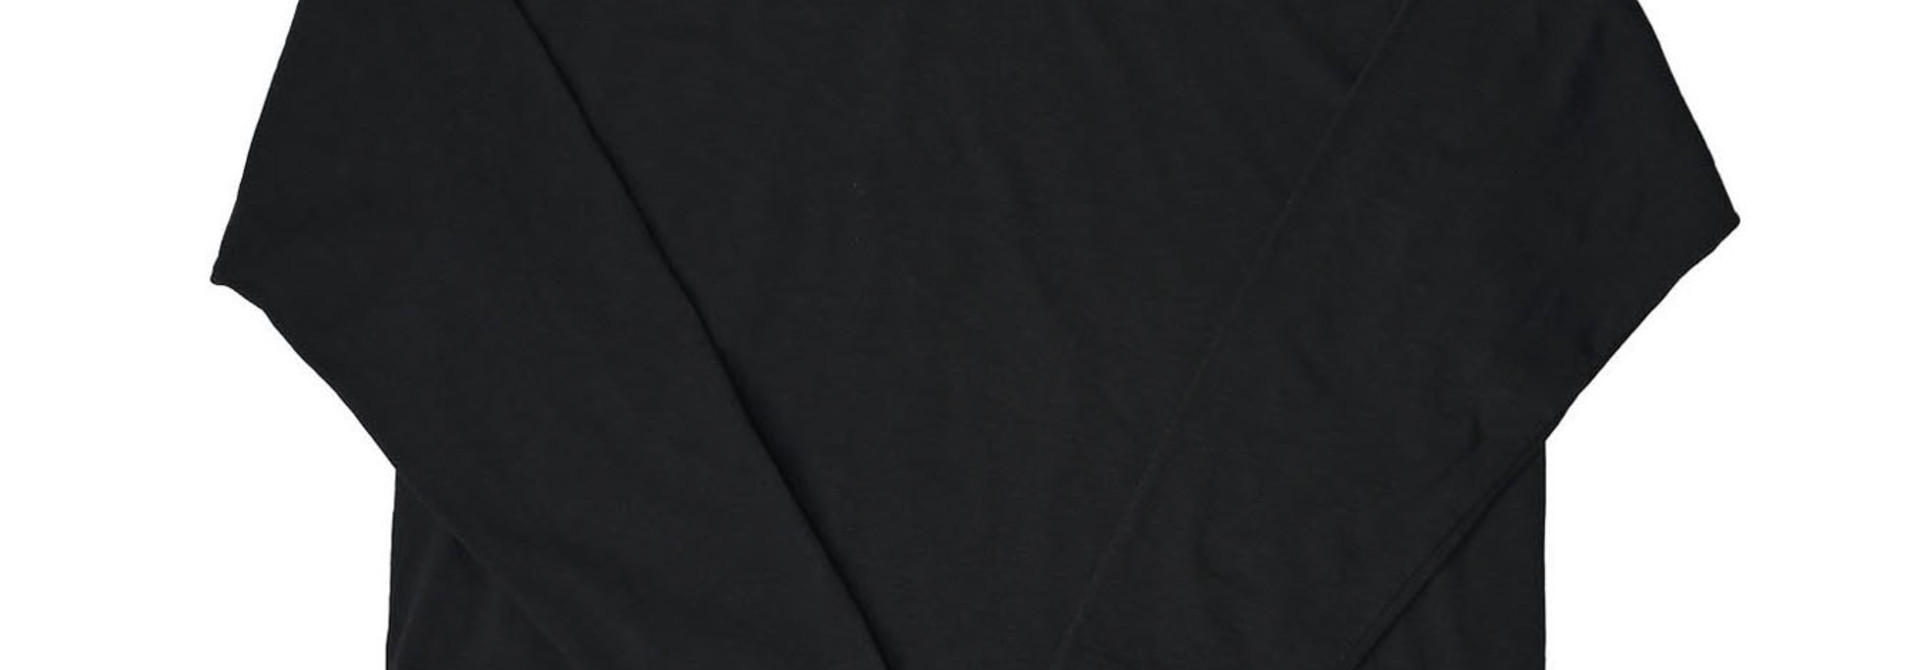 Zimbabwe Cotton Ocean Long-sleeved T-shirt